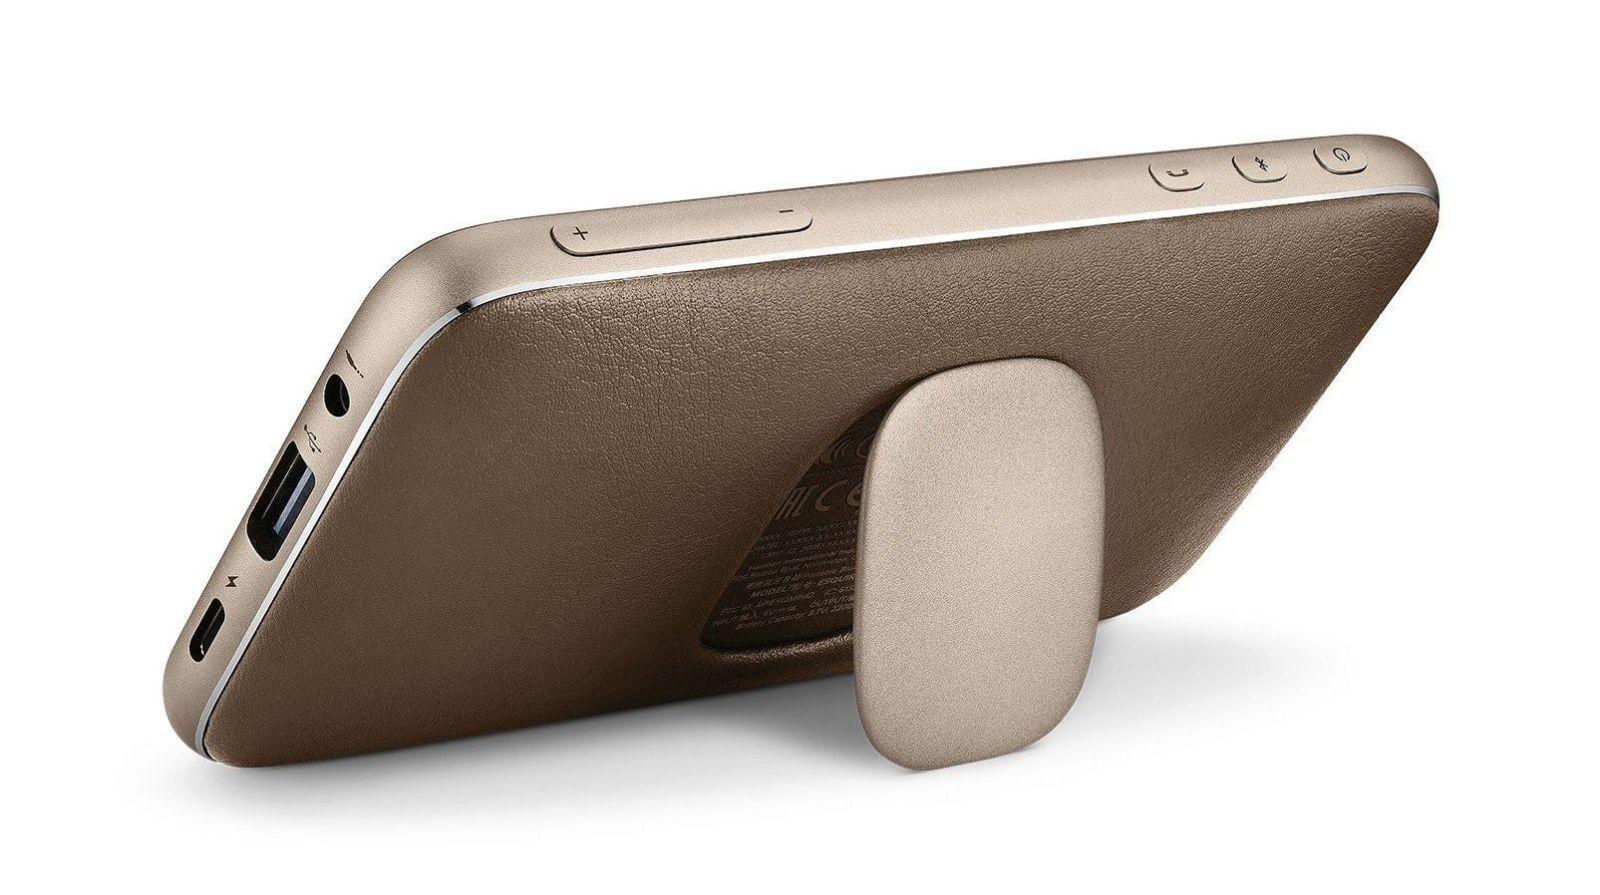 Harman Kardon выпустила портативную колонку Esquire Mini 2 в России (hk esquiremini2 back copperbrown 1605x1605px e1553086858334)